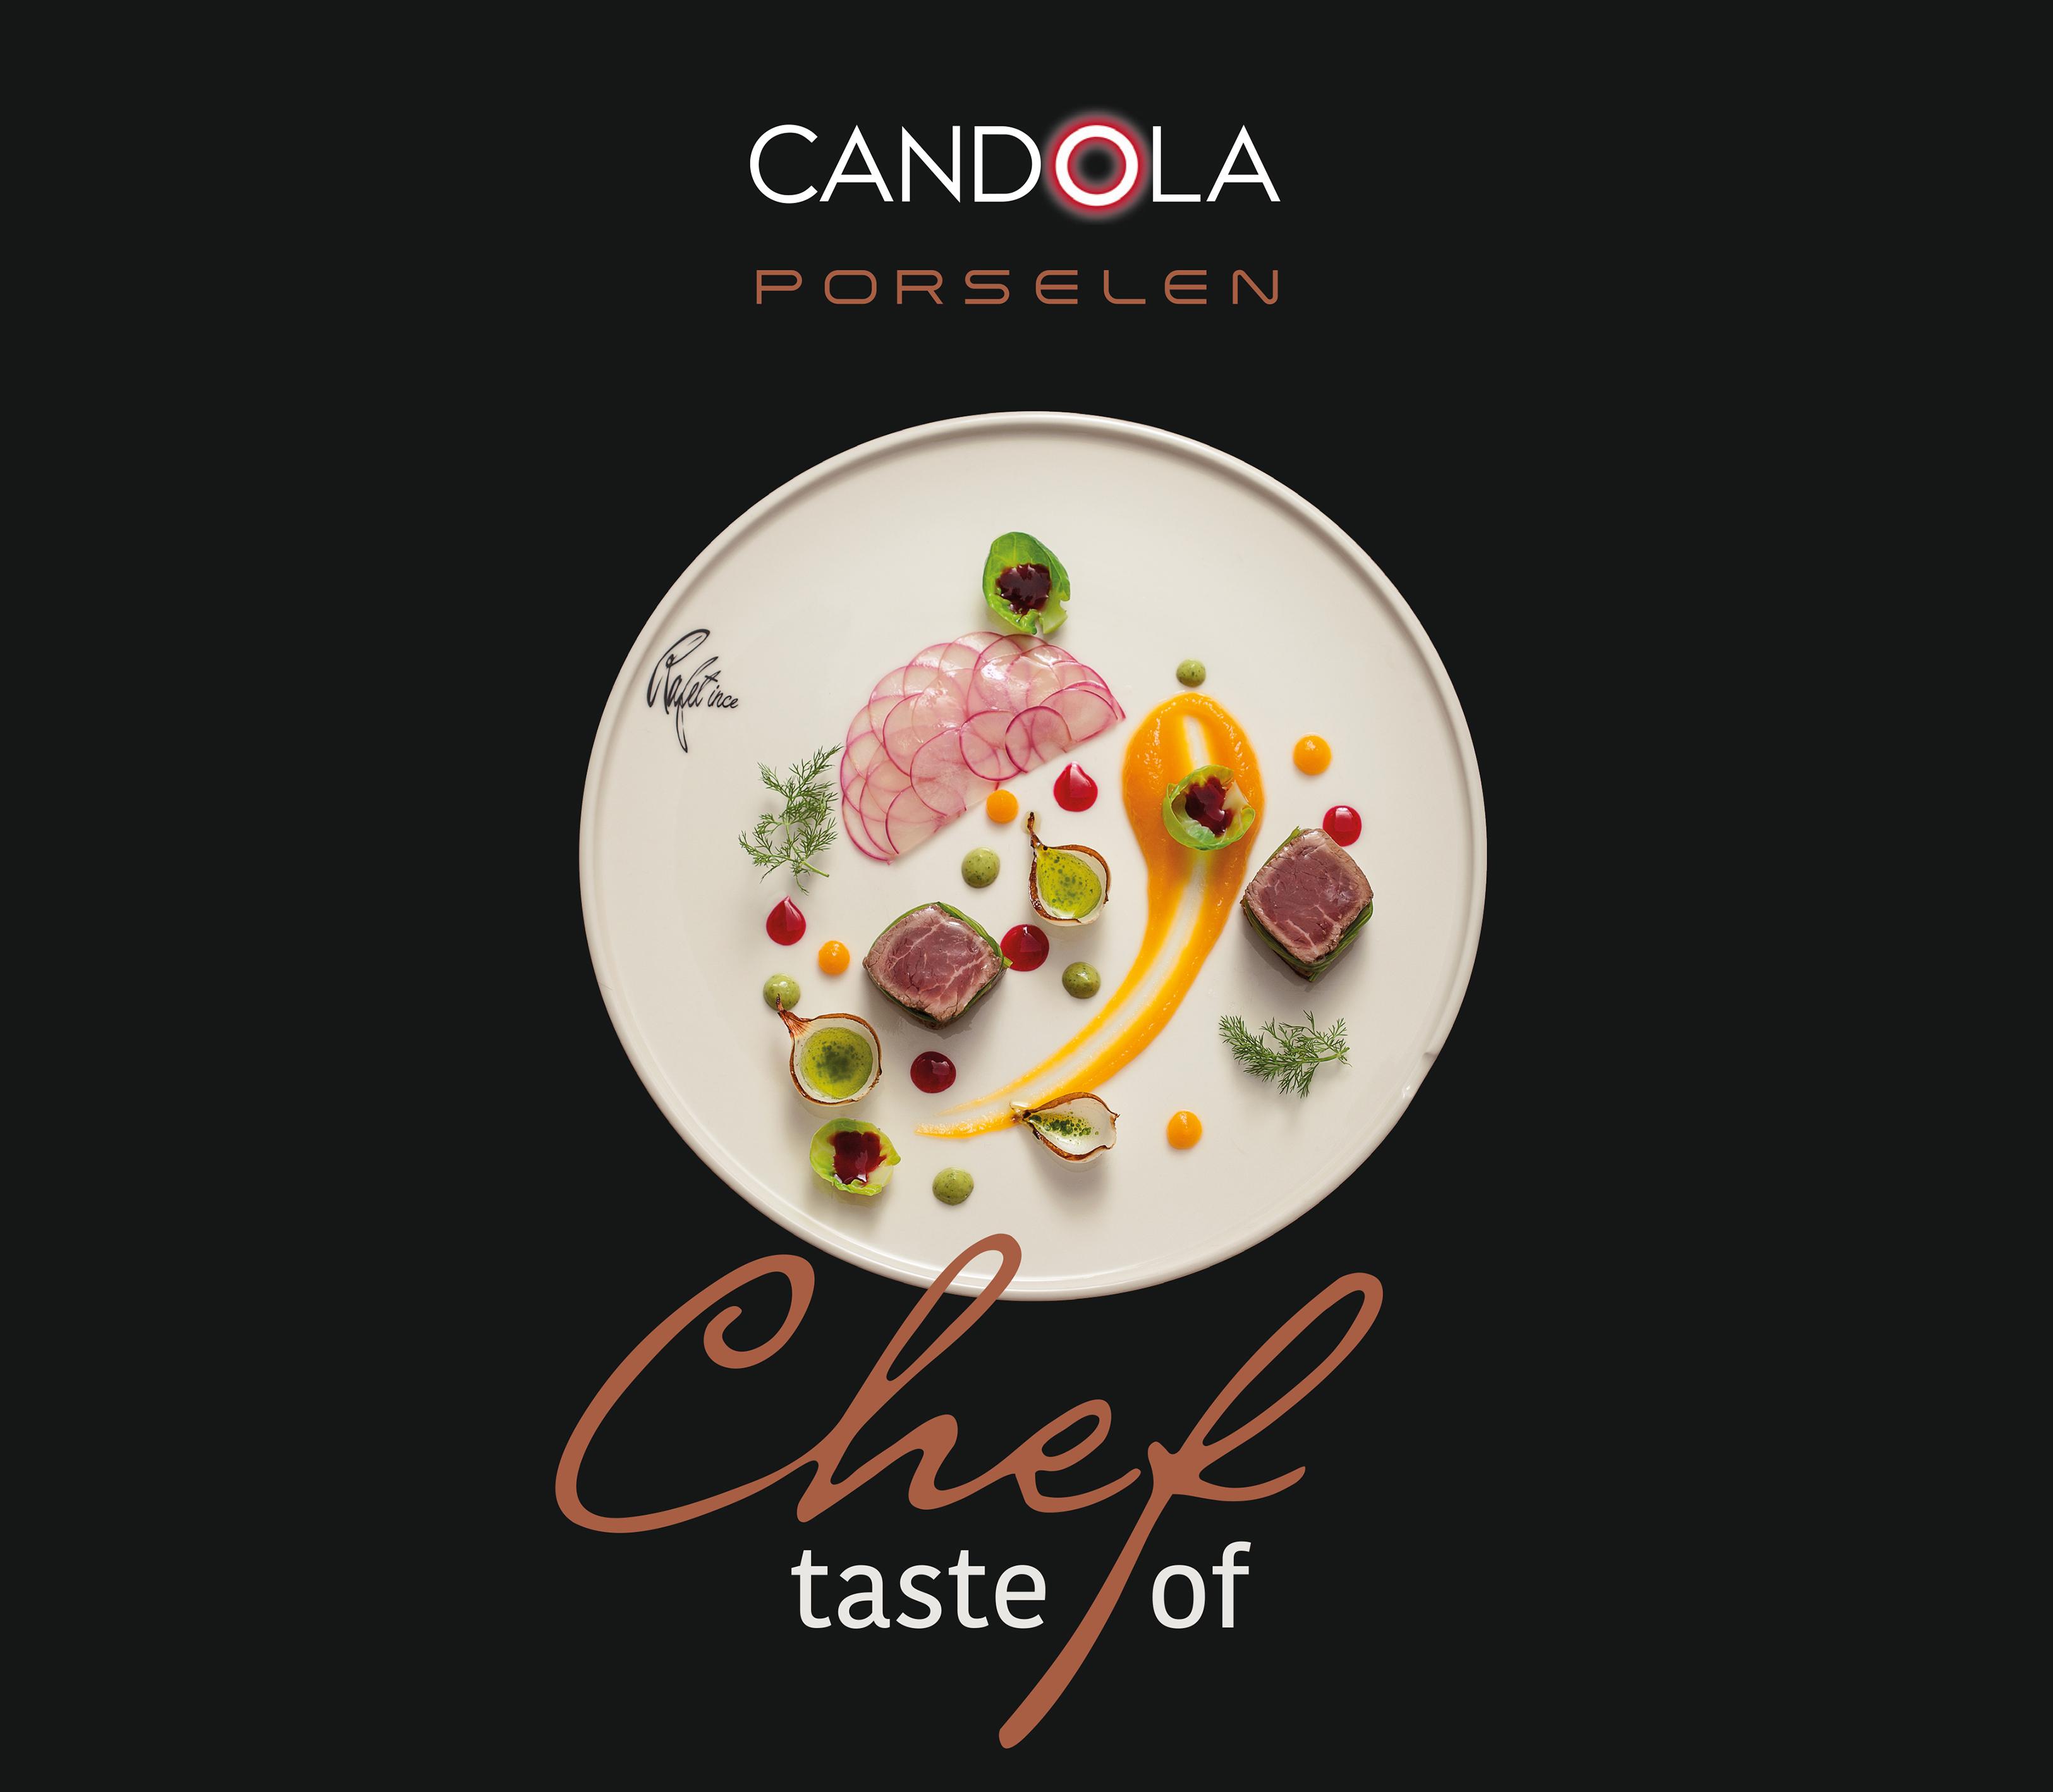 CANDOLA_Chef_taste_of_katalog_2020_titulka1